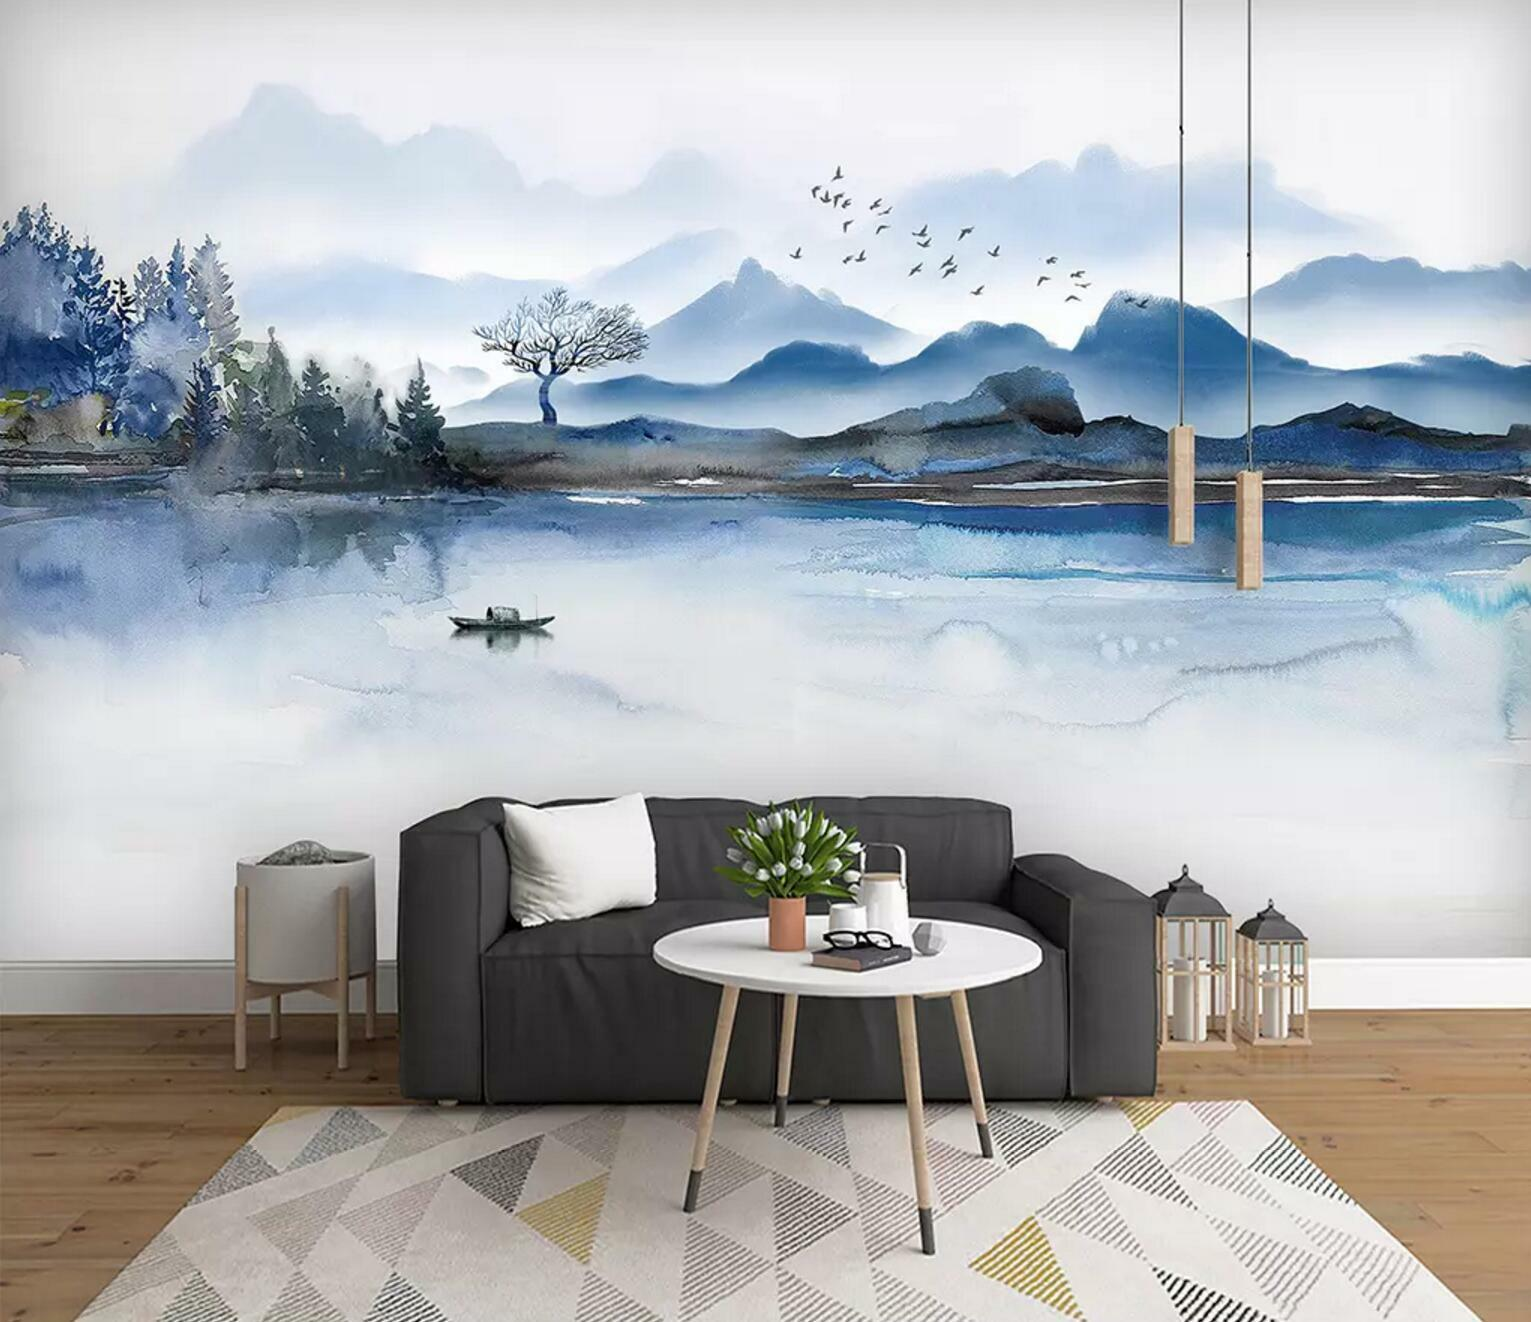 3D Ink Landscape 67 Wall Paper Exclusive MXY Wallpaper Mural Decal Indoor wall